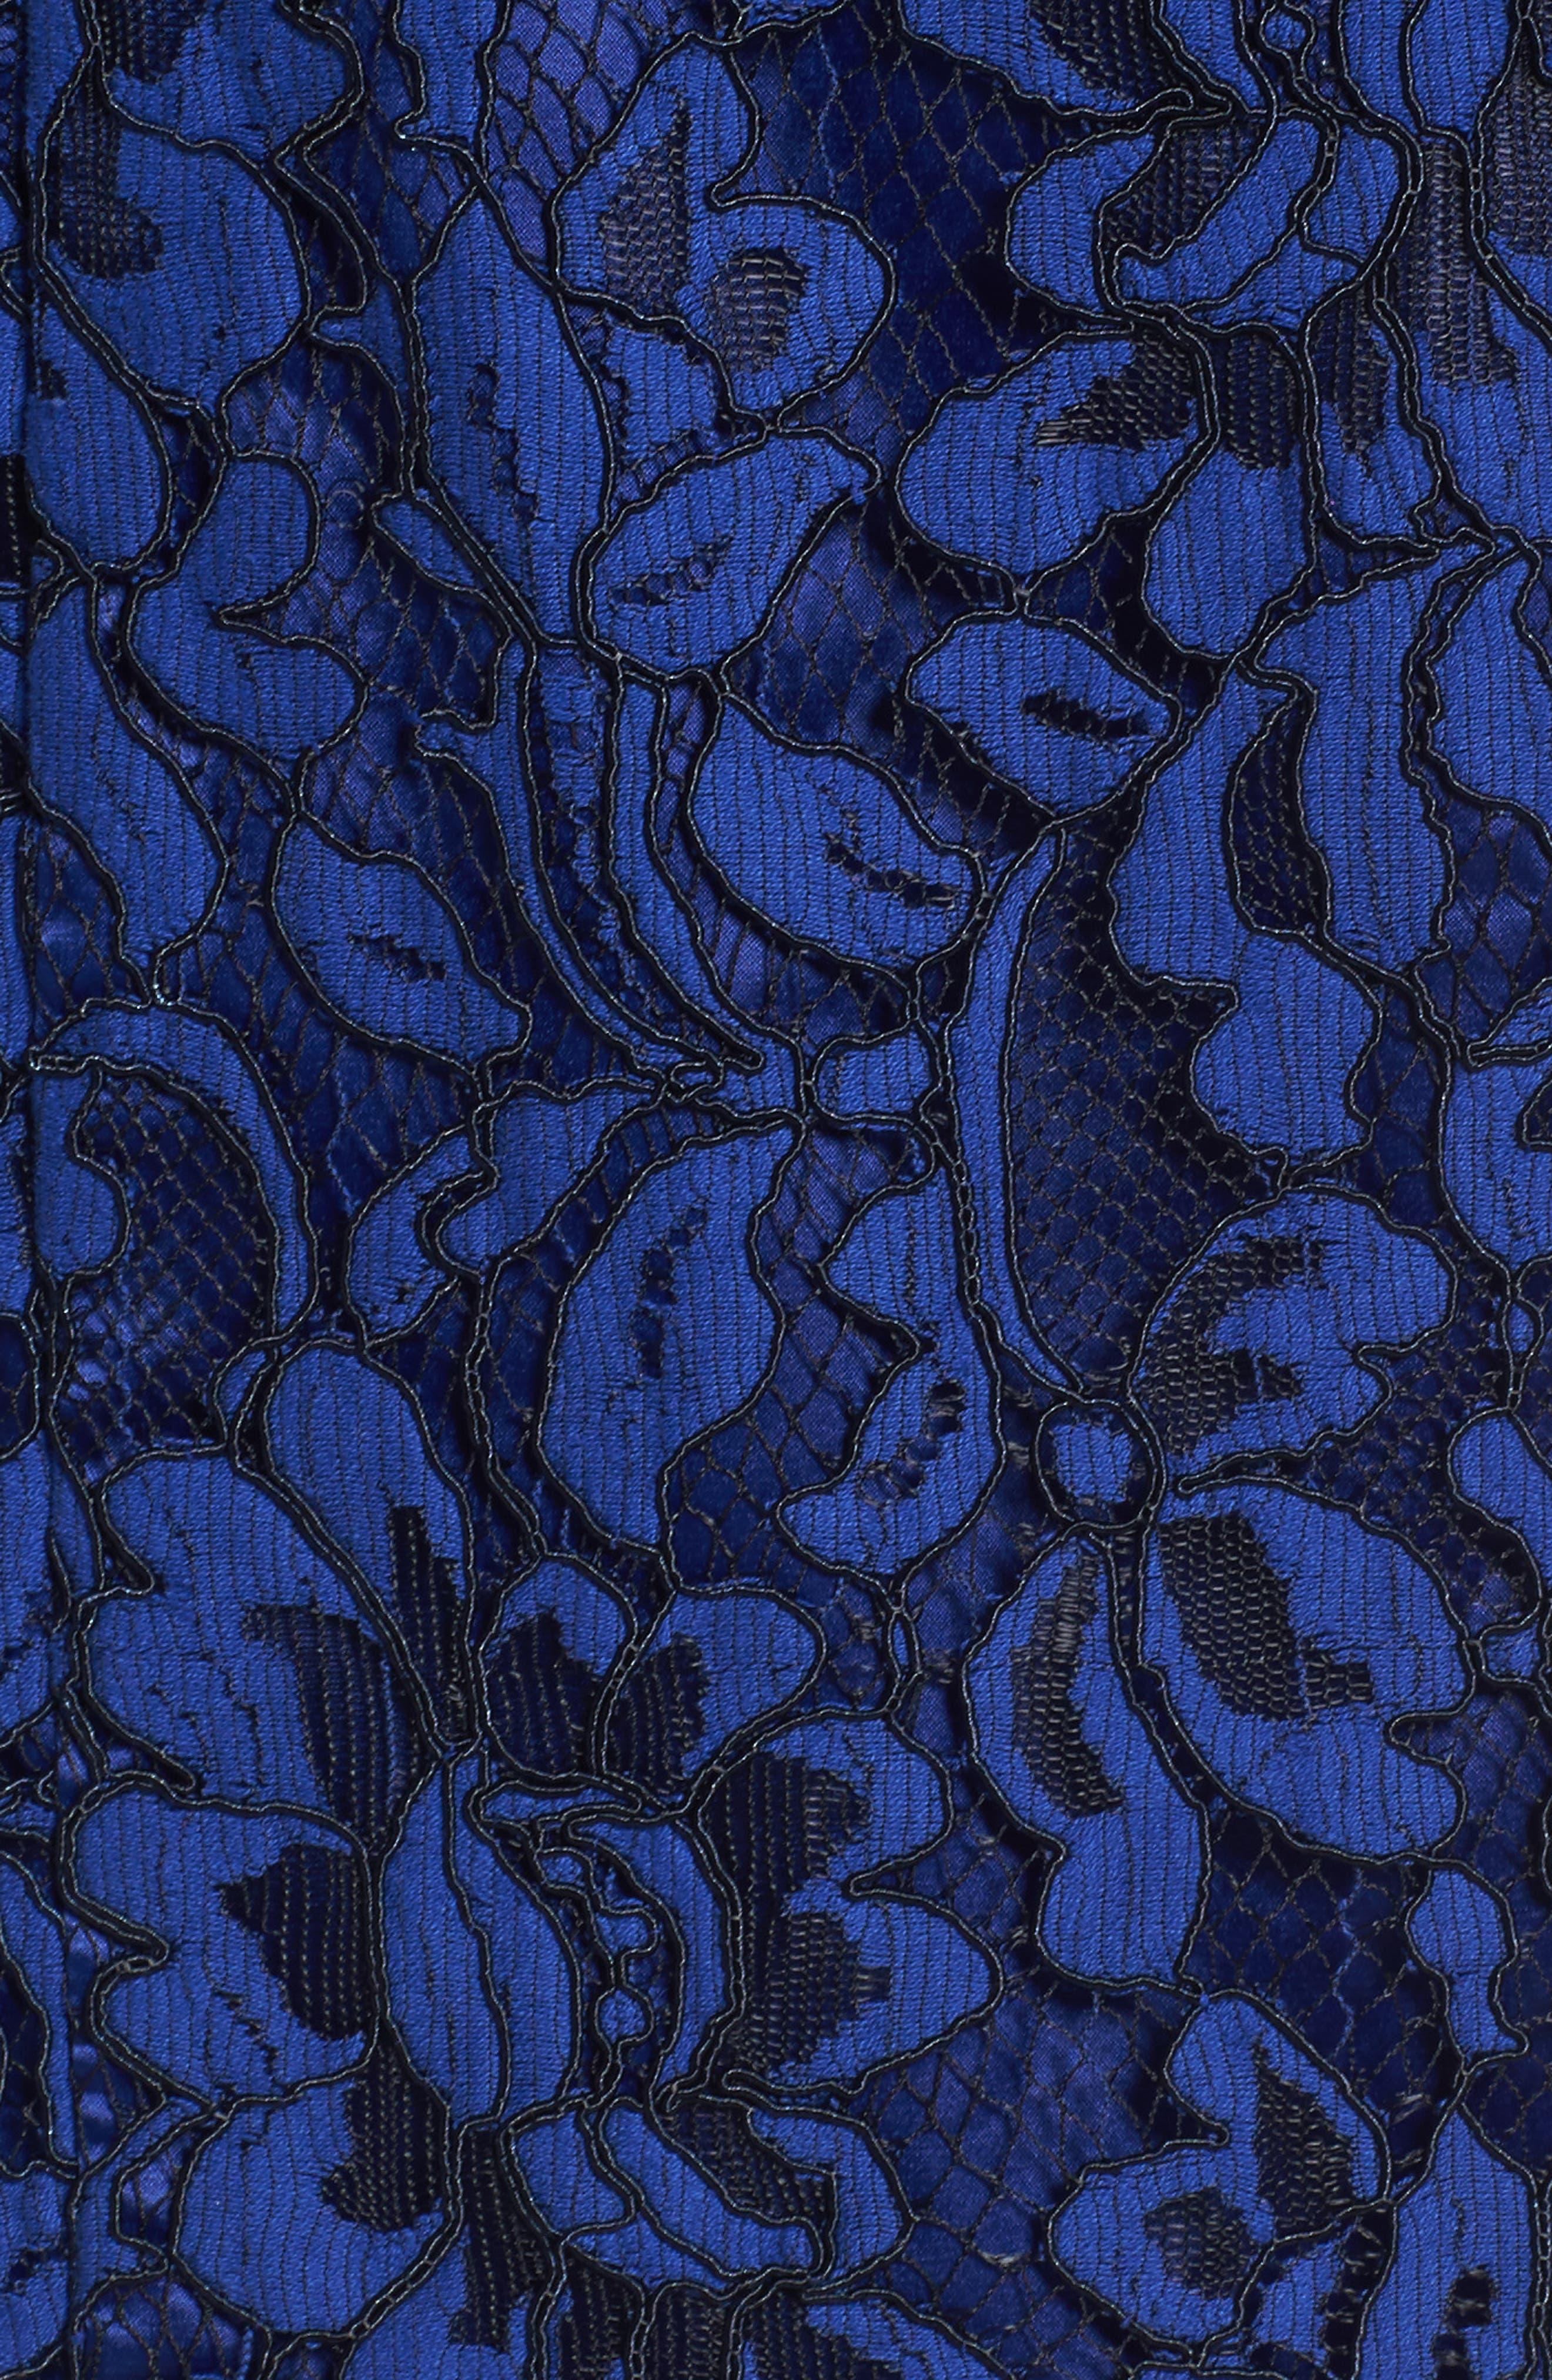 Bell Sleeve Lace Sheath Dress,                             Alternate thumbnail 6, color,                             Cobalt